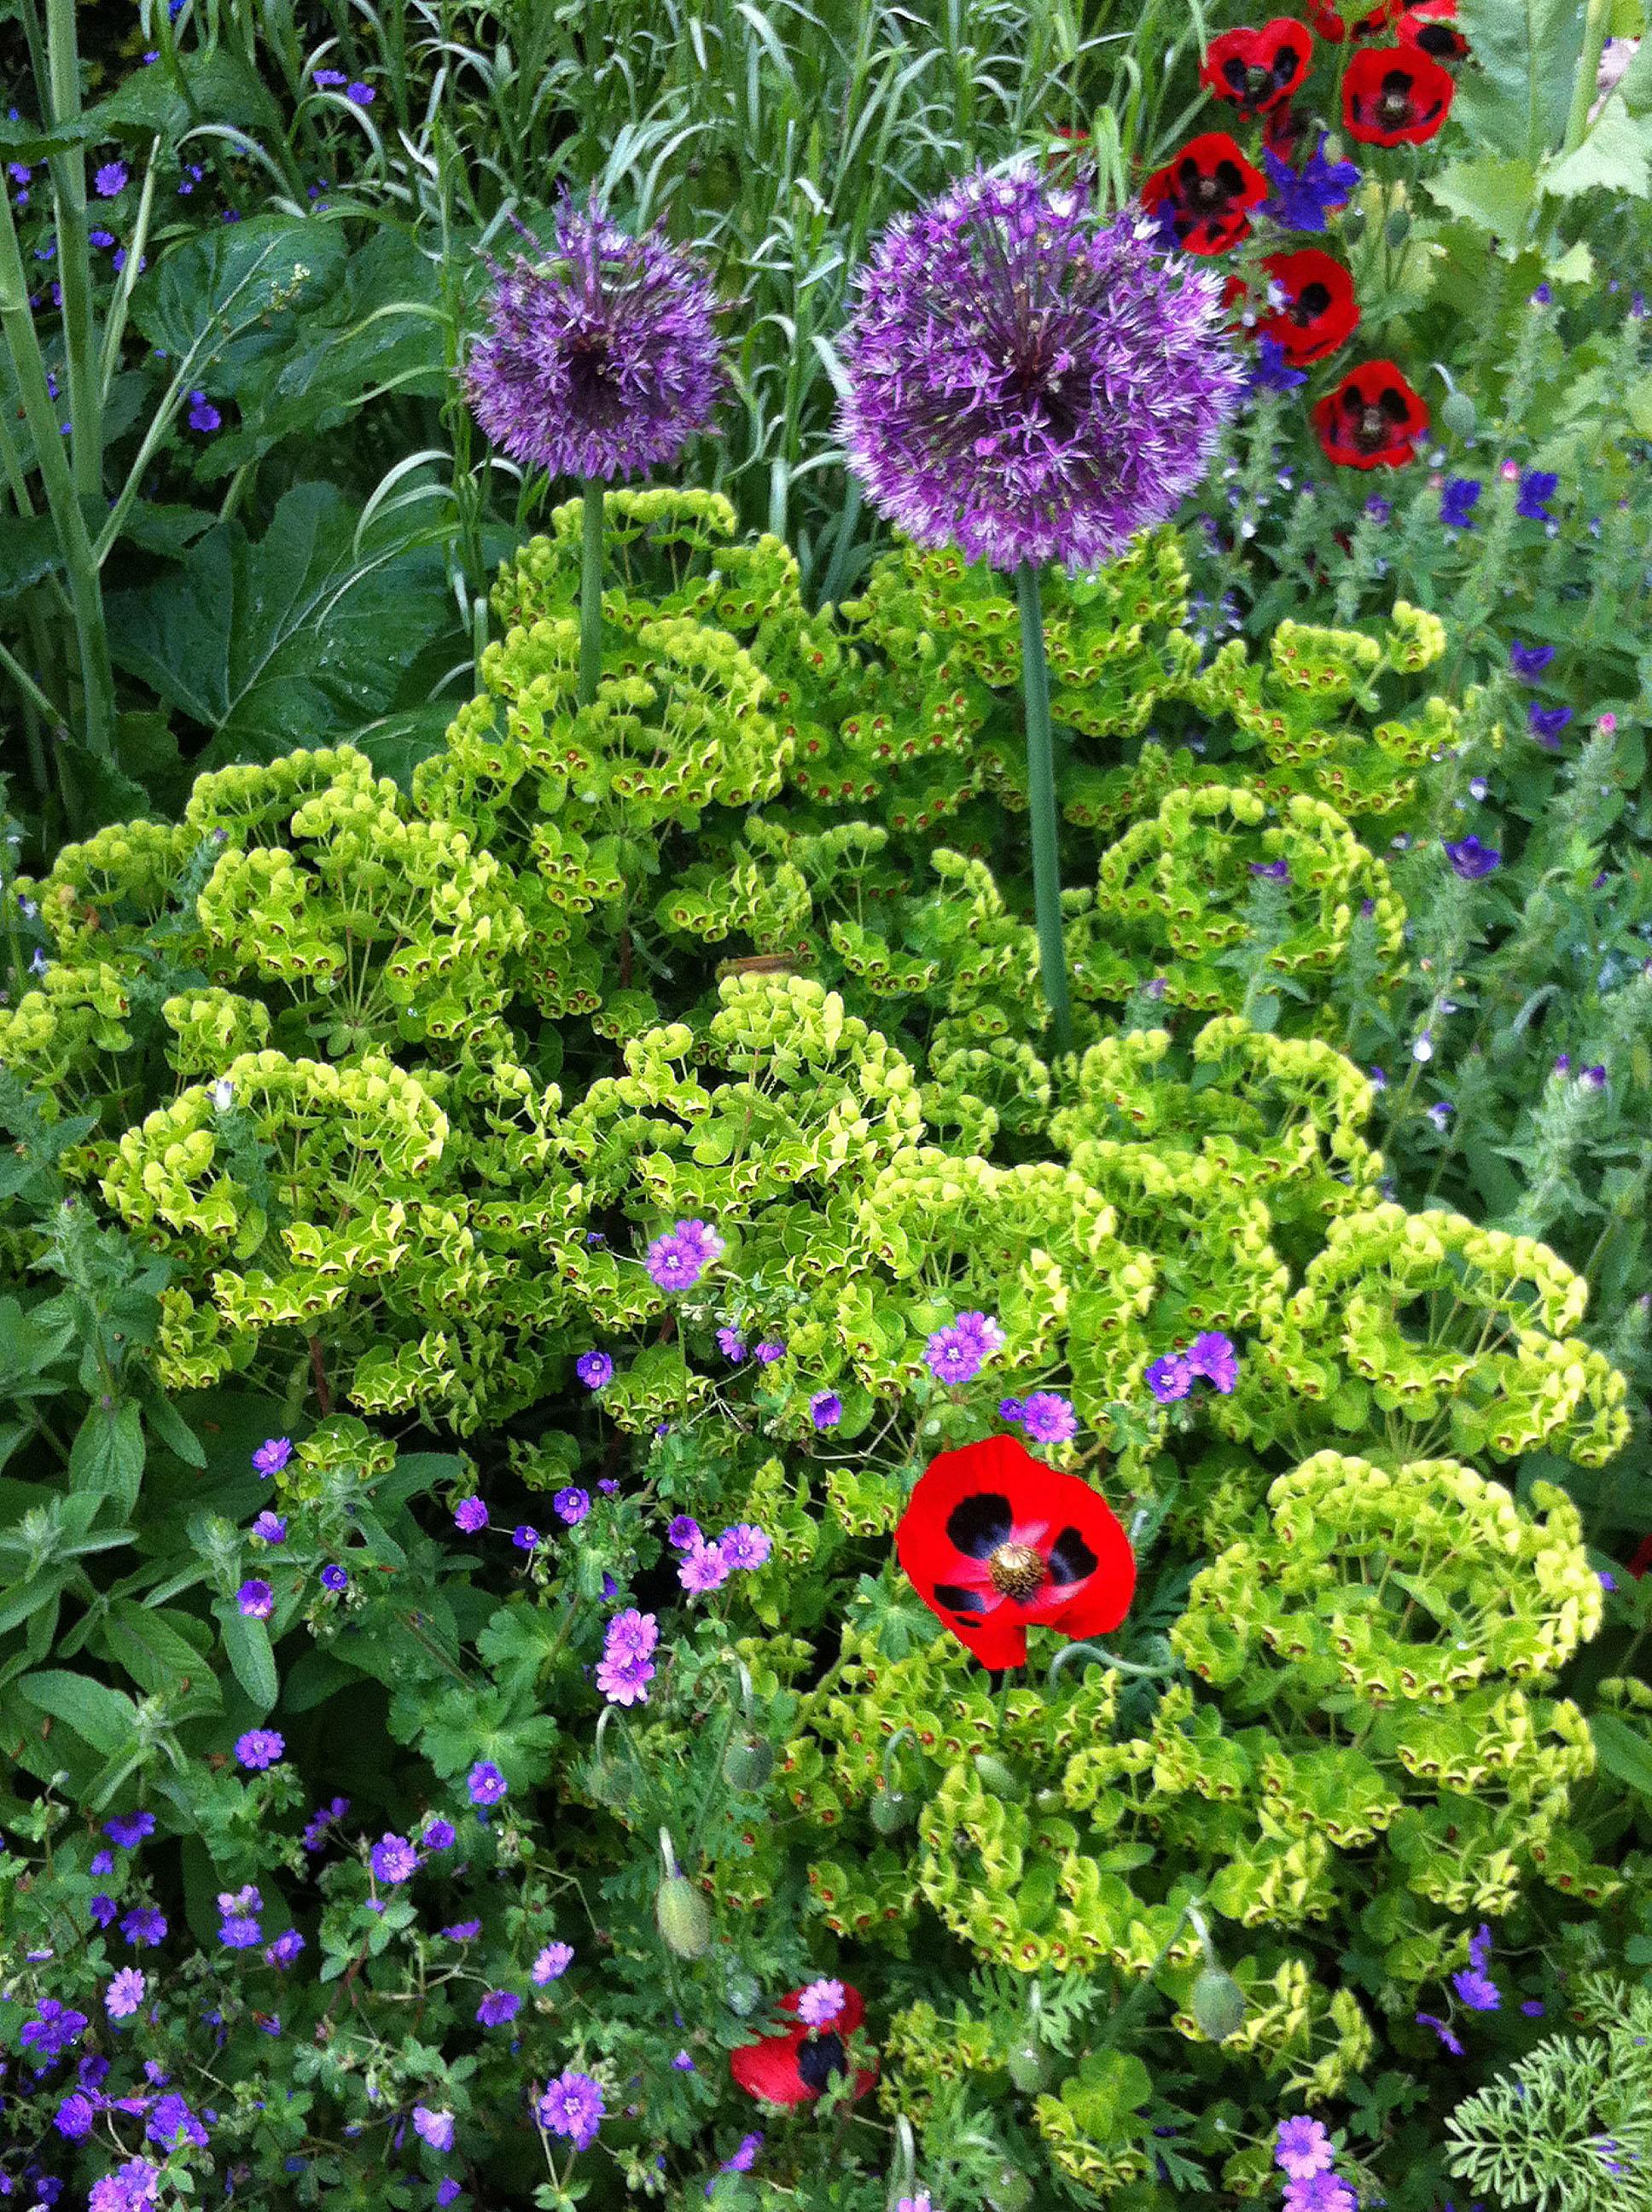 Eleaner and philip s garden outer space garden design for Outer space garden design clevedon